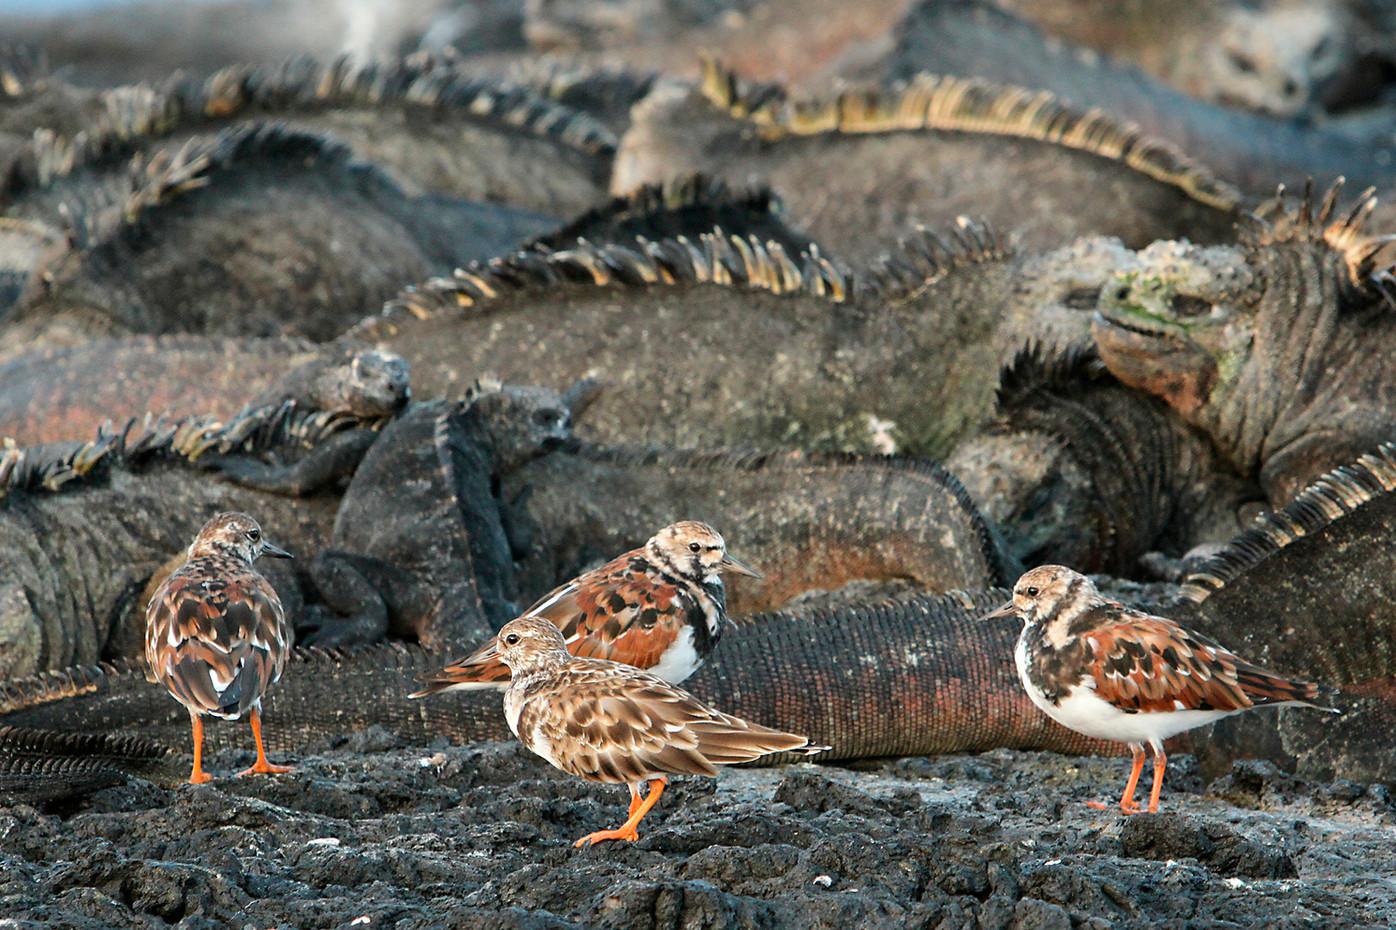 Ruddy Turnstones & Marine Iguanas in the Galapagos Islands, Equador